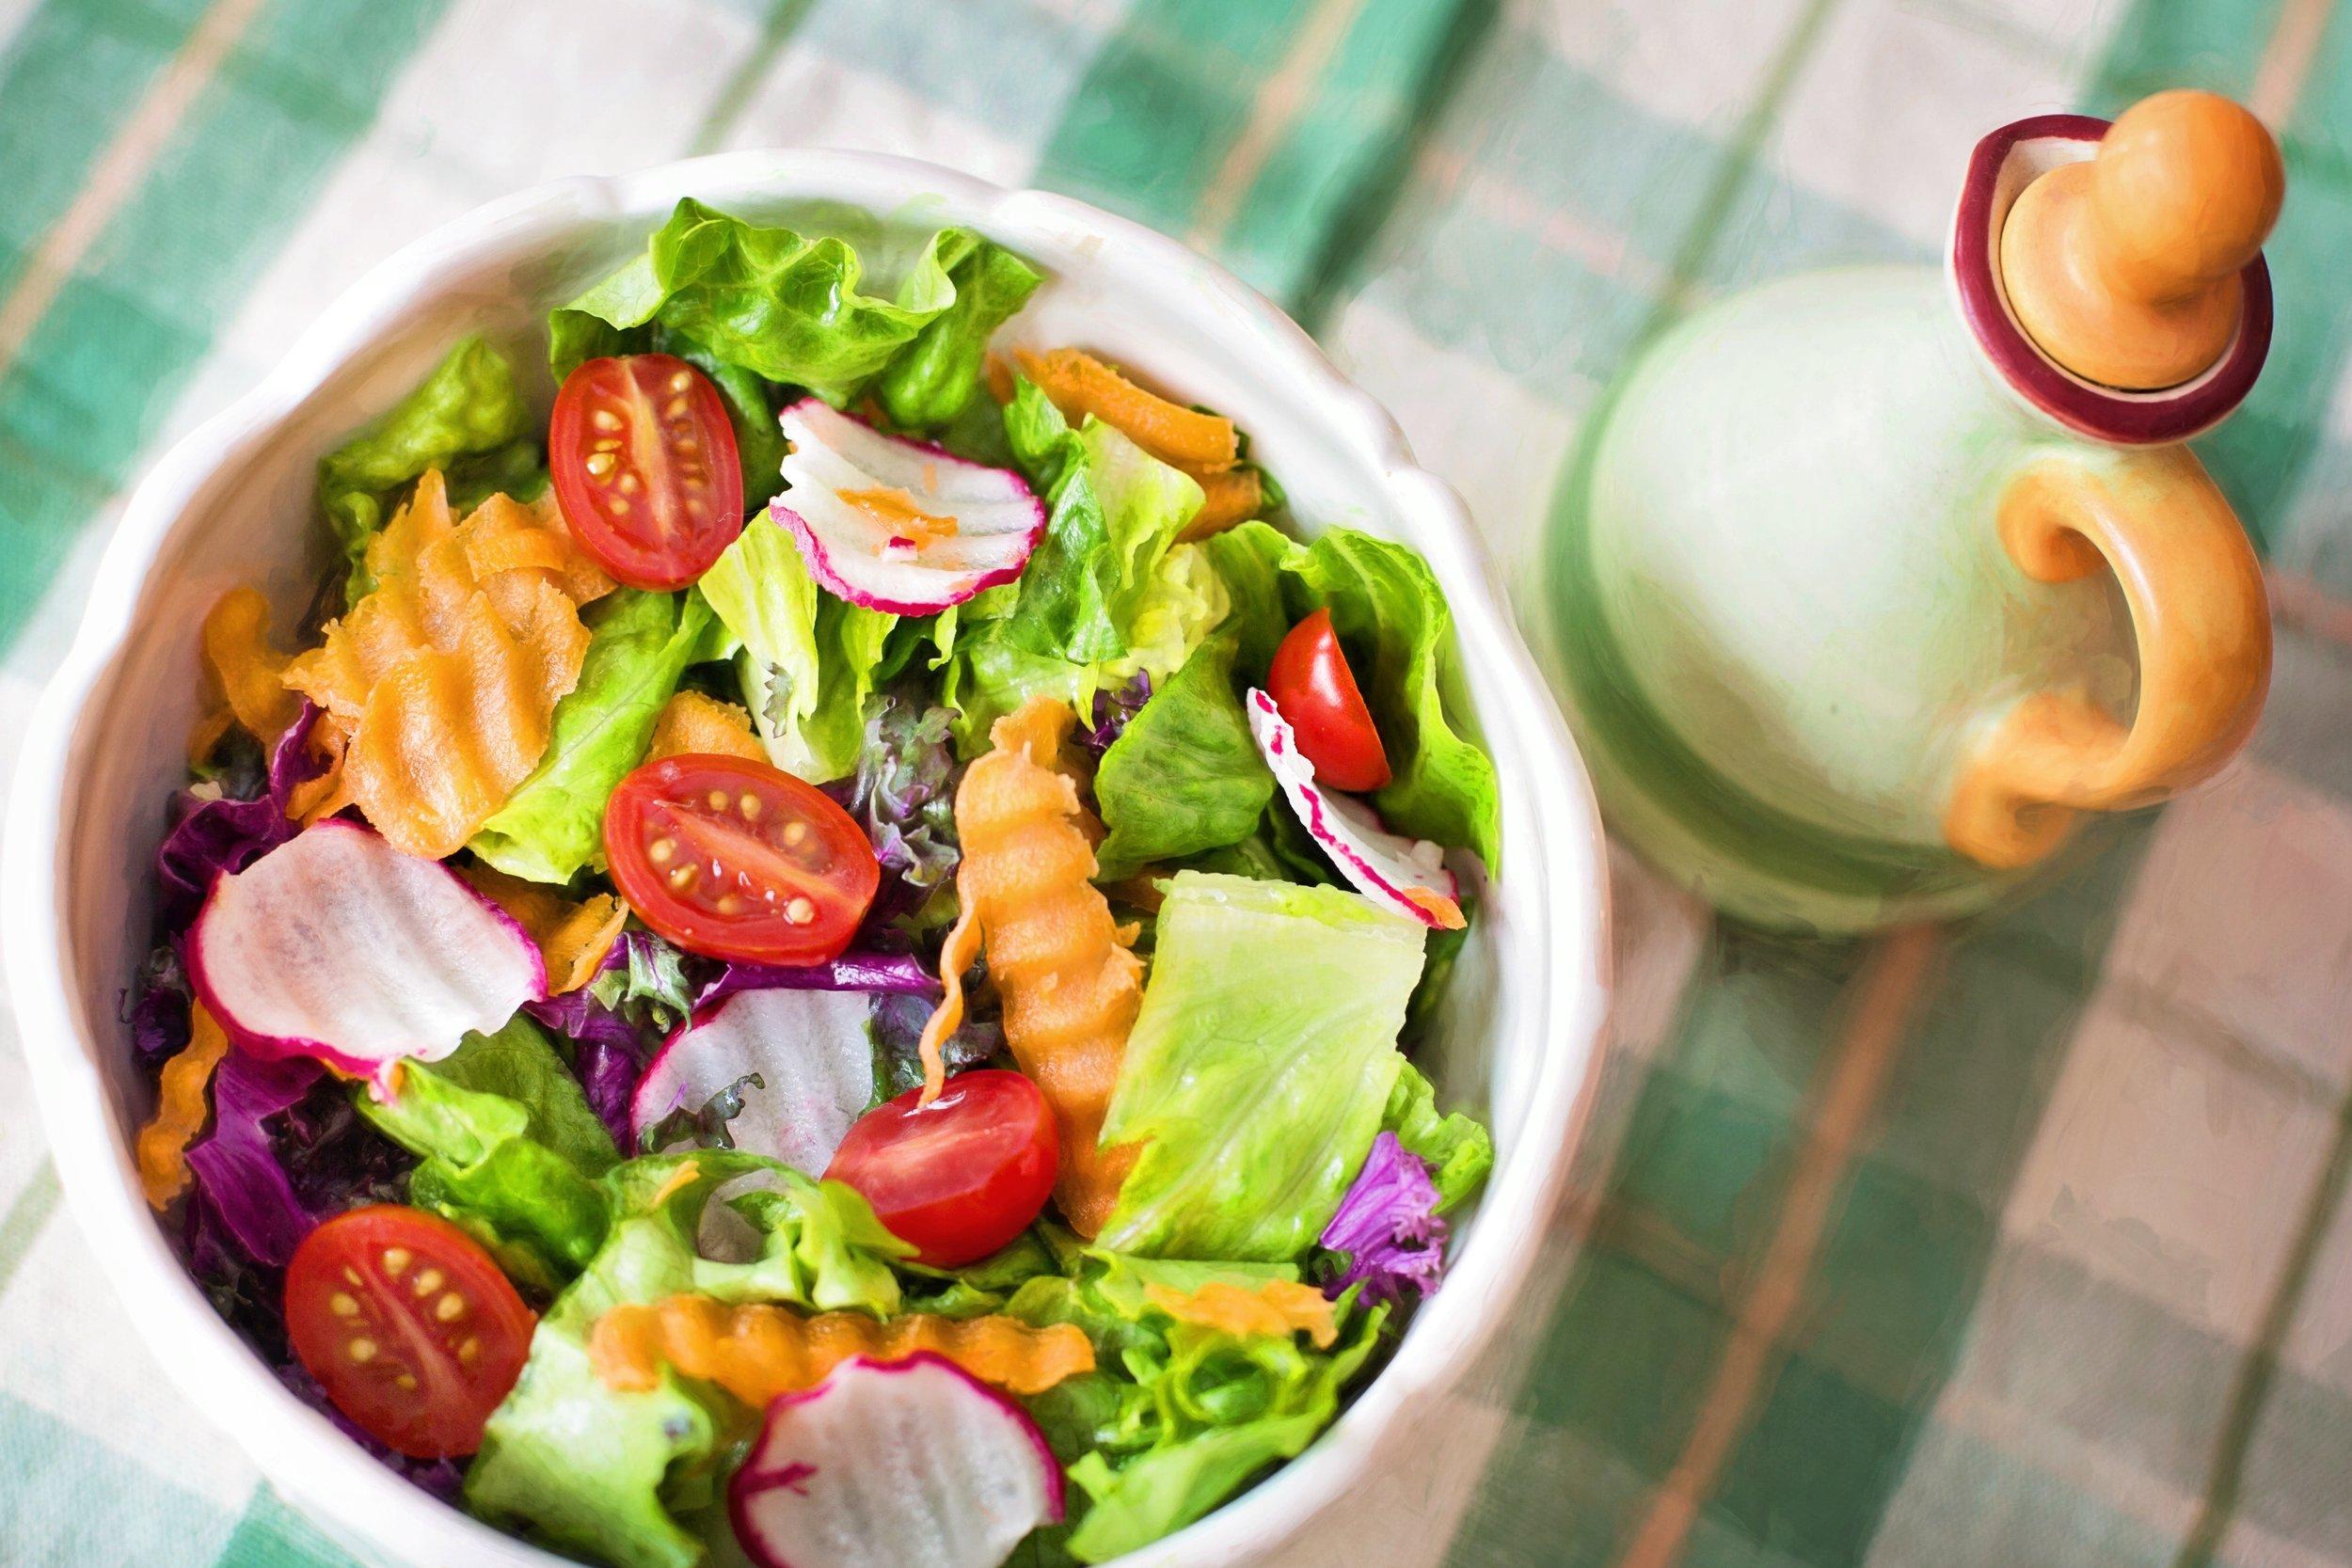 bowl-delicious-diet-257816.jpg